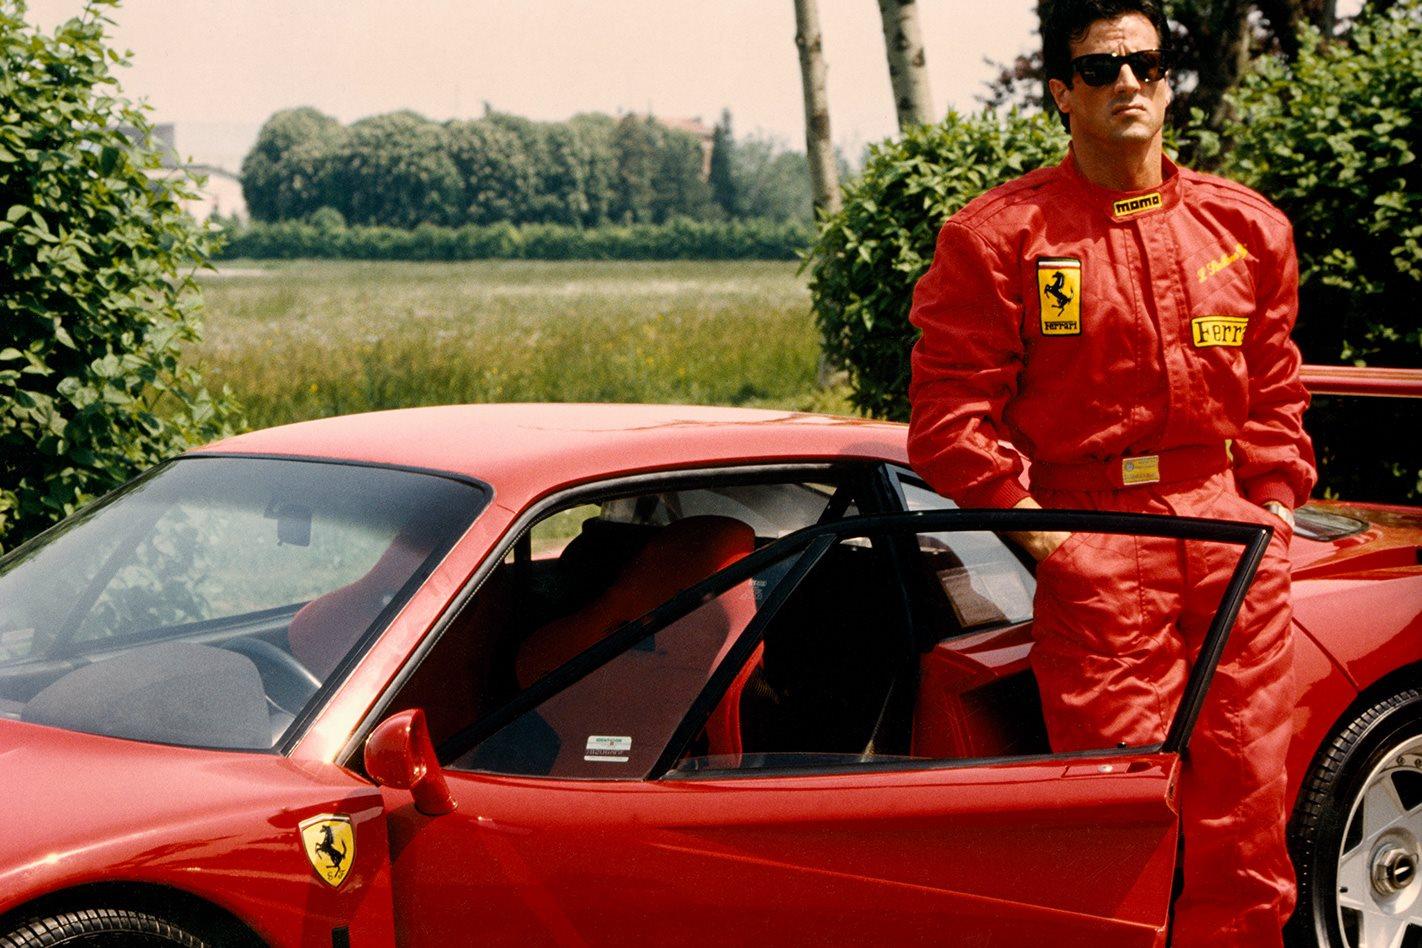 Sylvester Stallone at Fiorano 1990